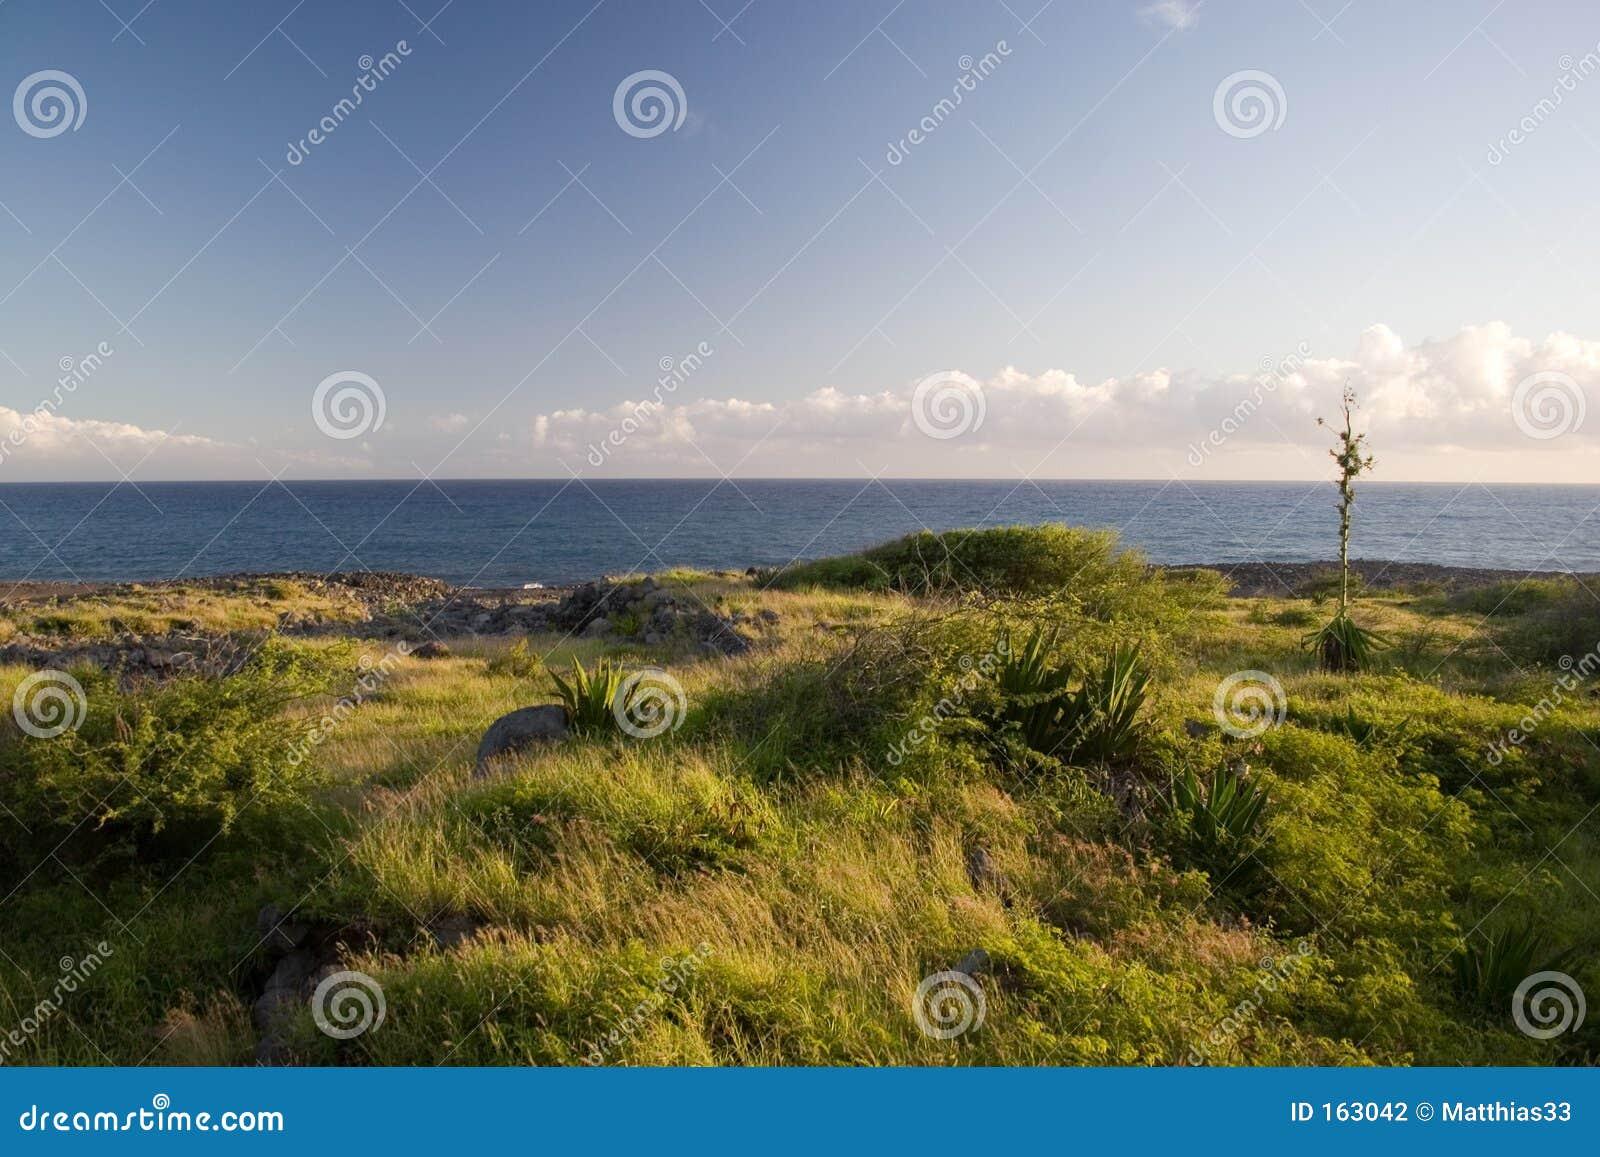 Verdure d océan